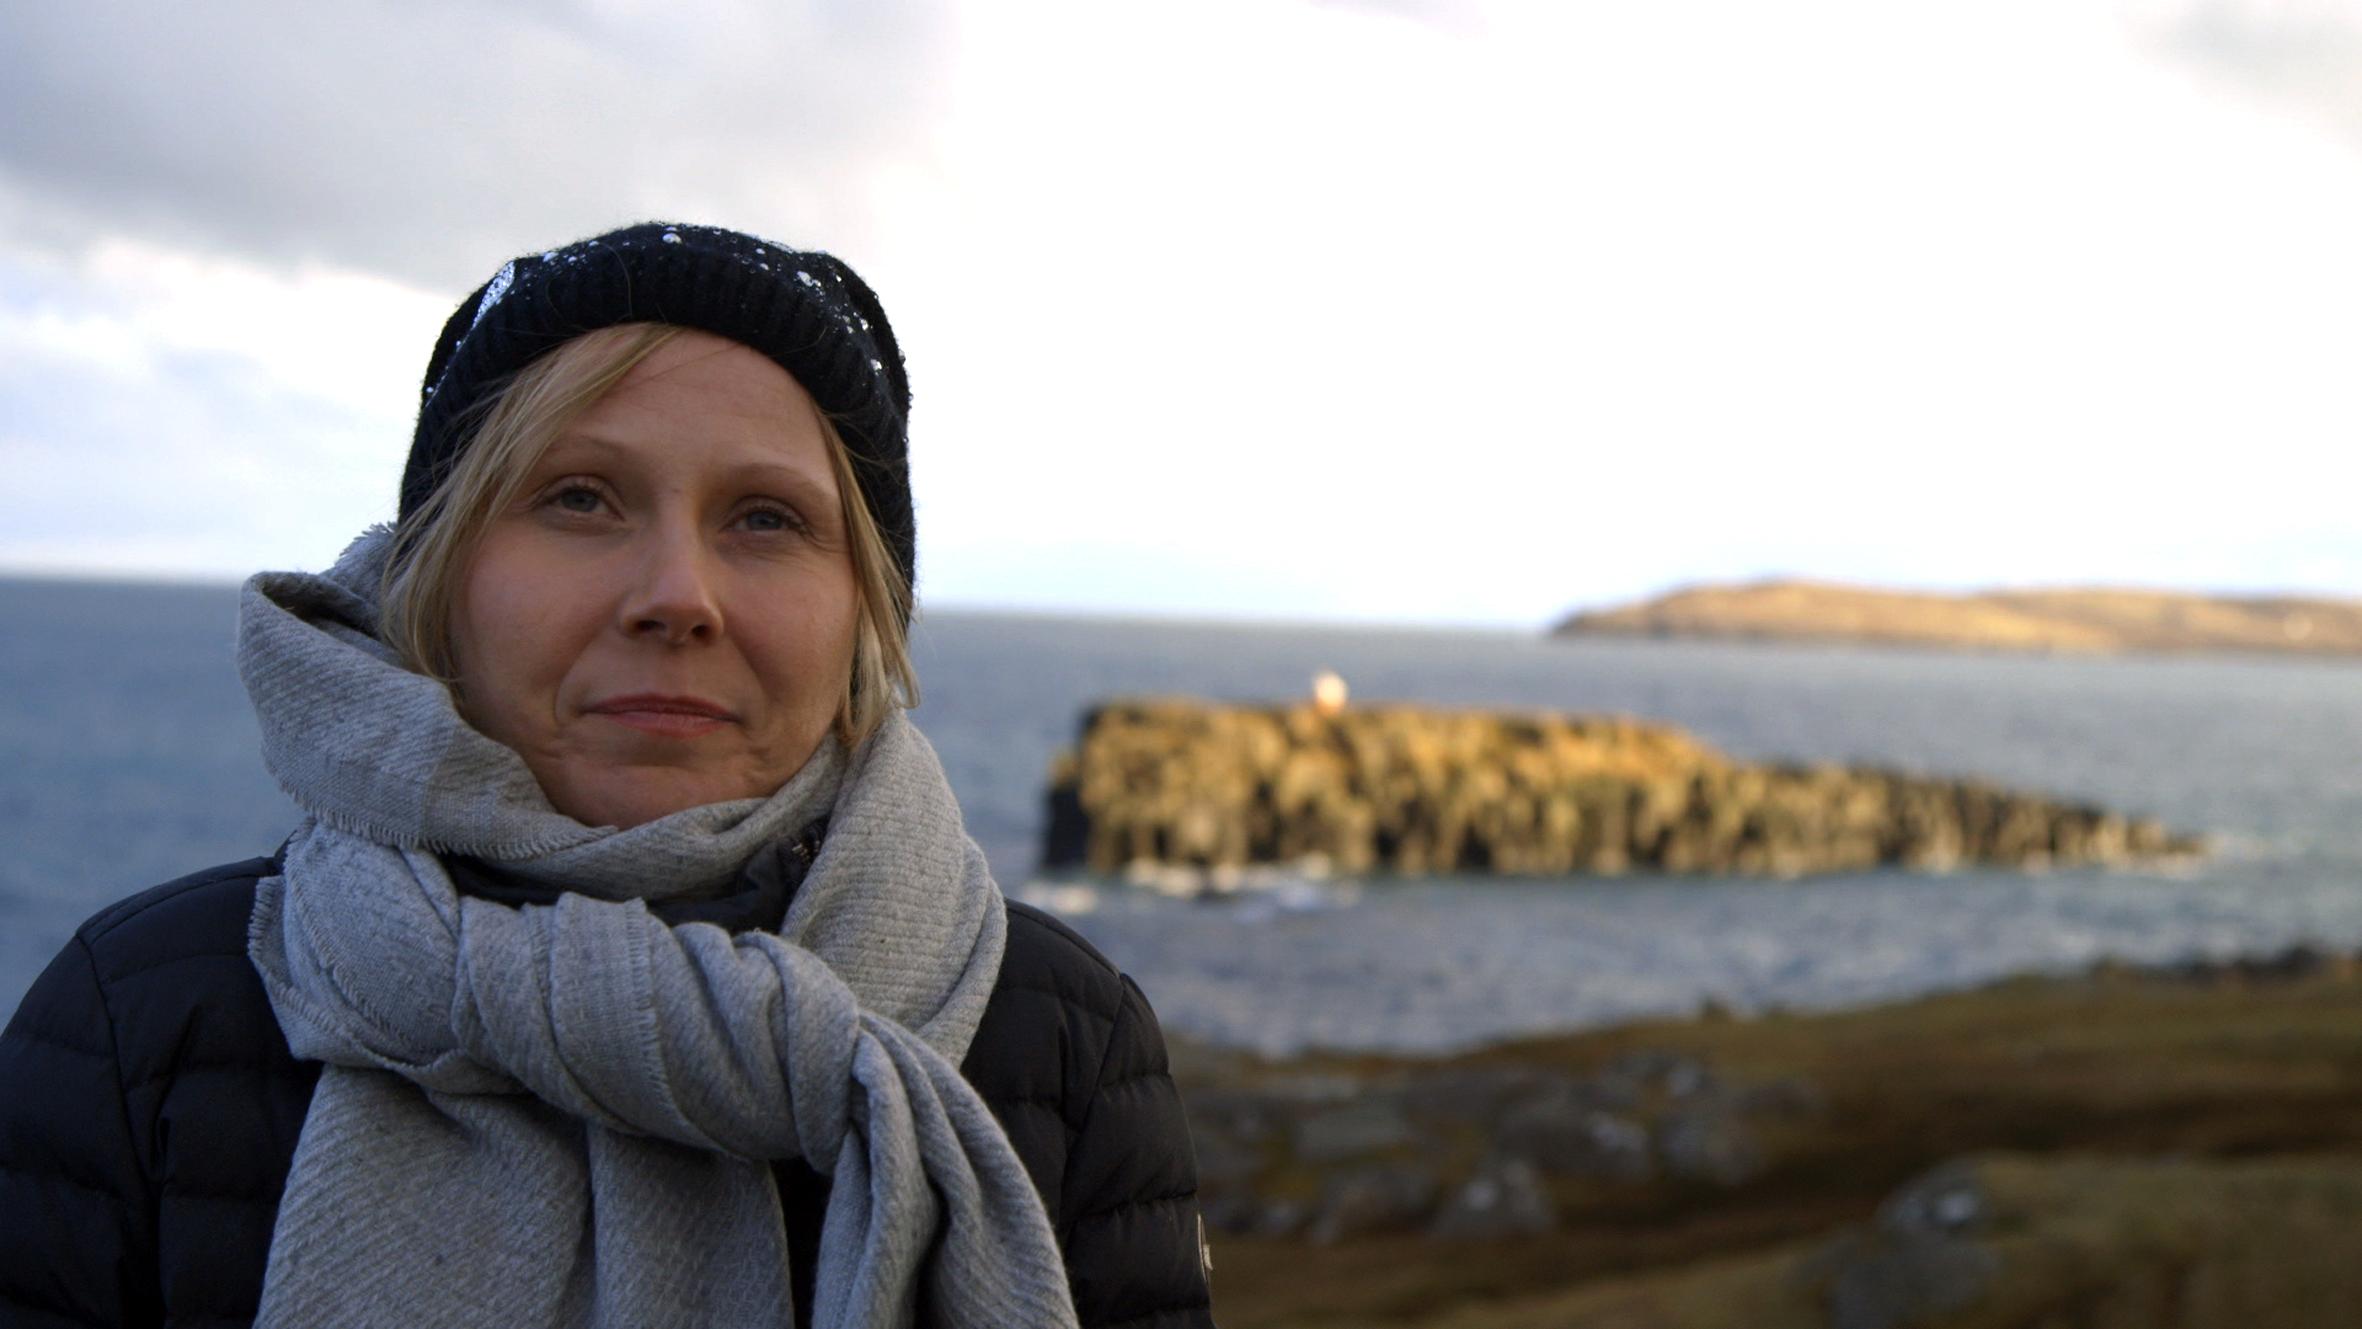 Mariann Poulsen giftede sig i 2008 med morderen Peter Lundin. Foto: Peter Hammer.